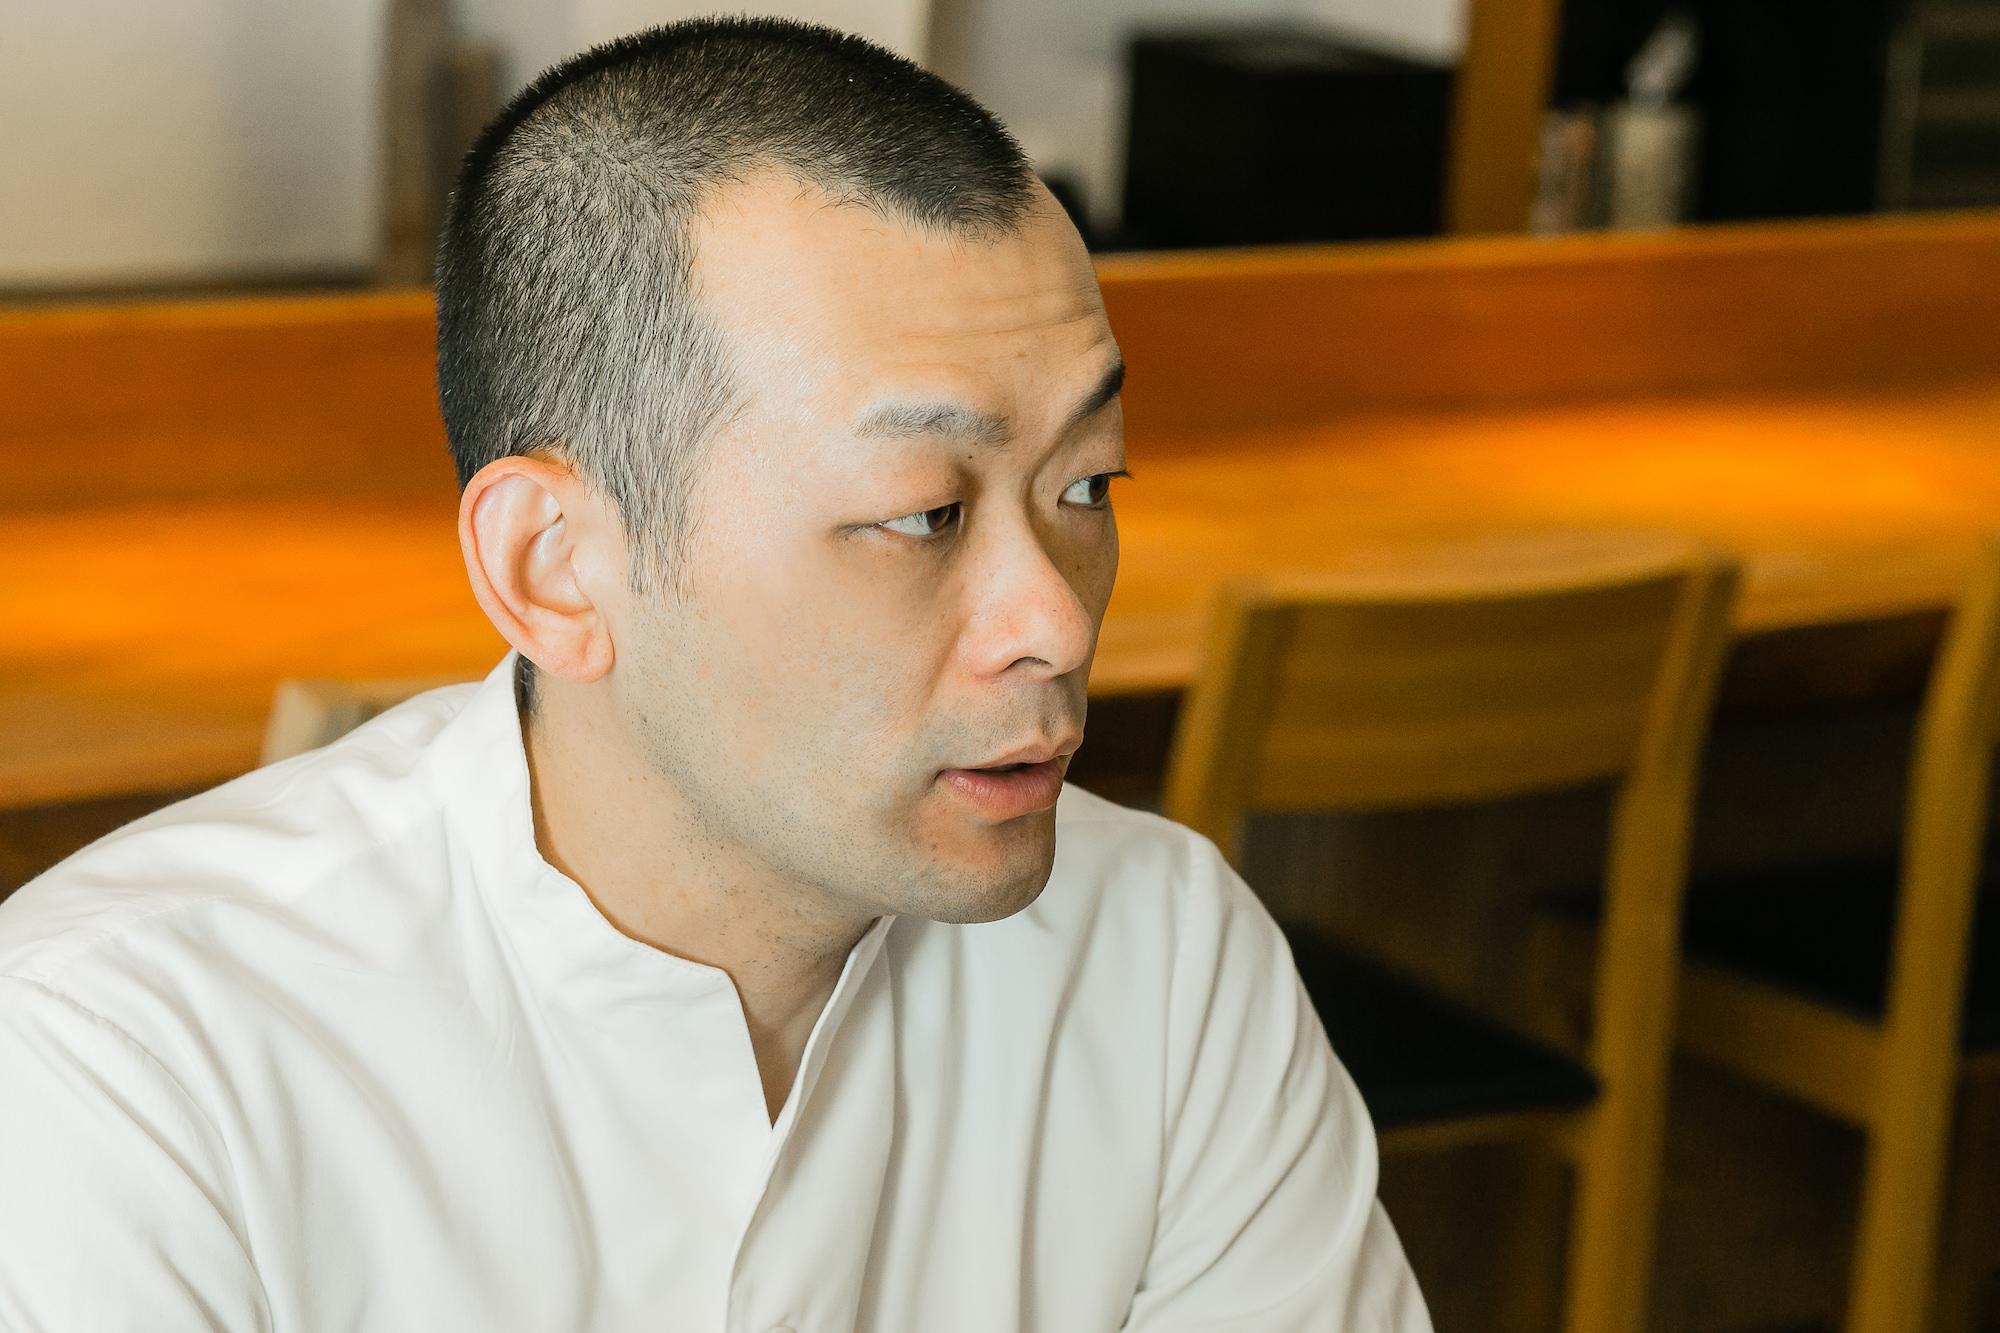 Utsubohonmachi Gaku Gaku Imagawa